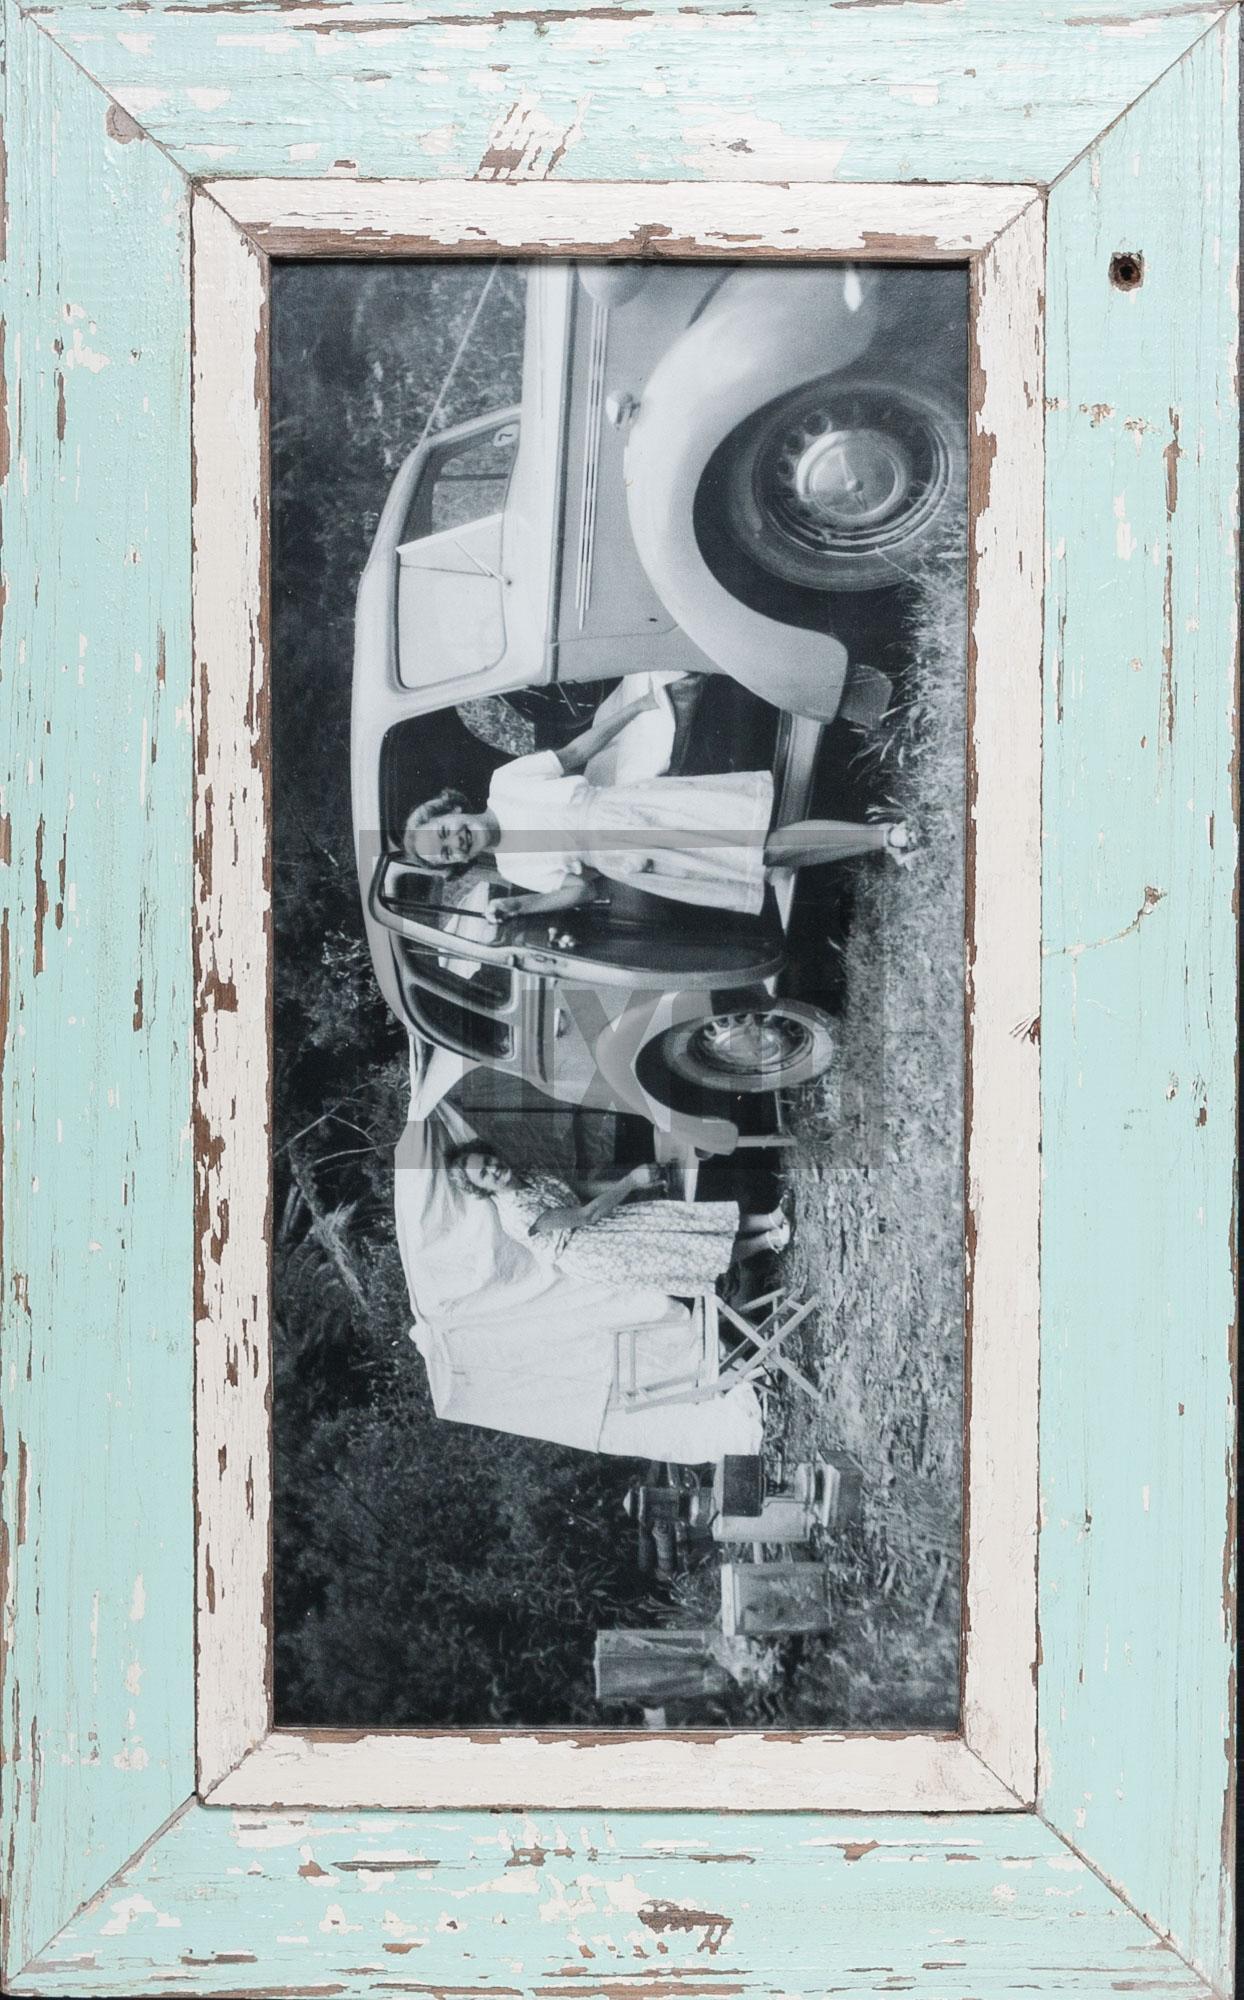 Panorama-Fotorahmen aus Recyclingholz für dein Lieblingsfoto